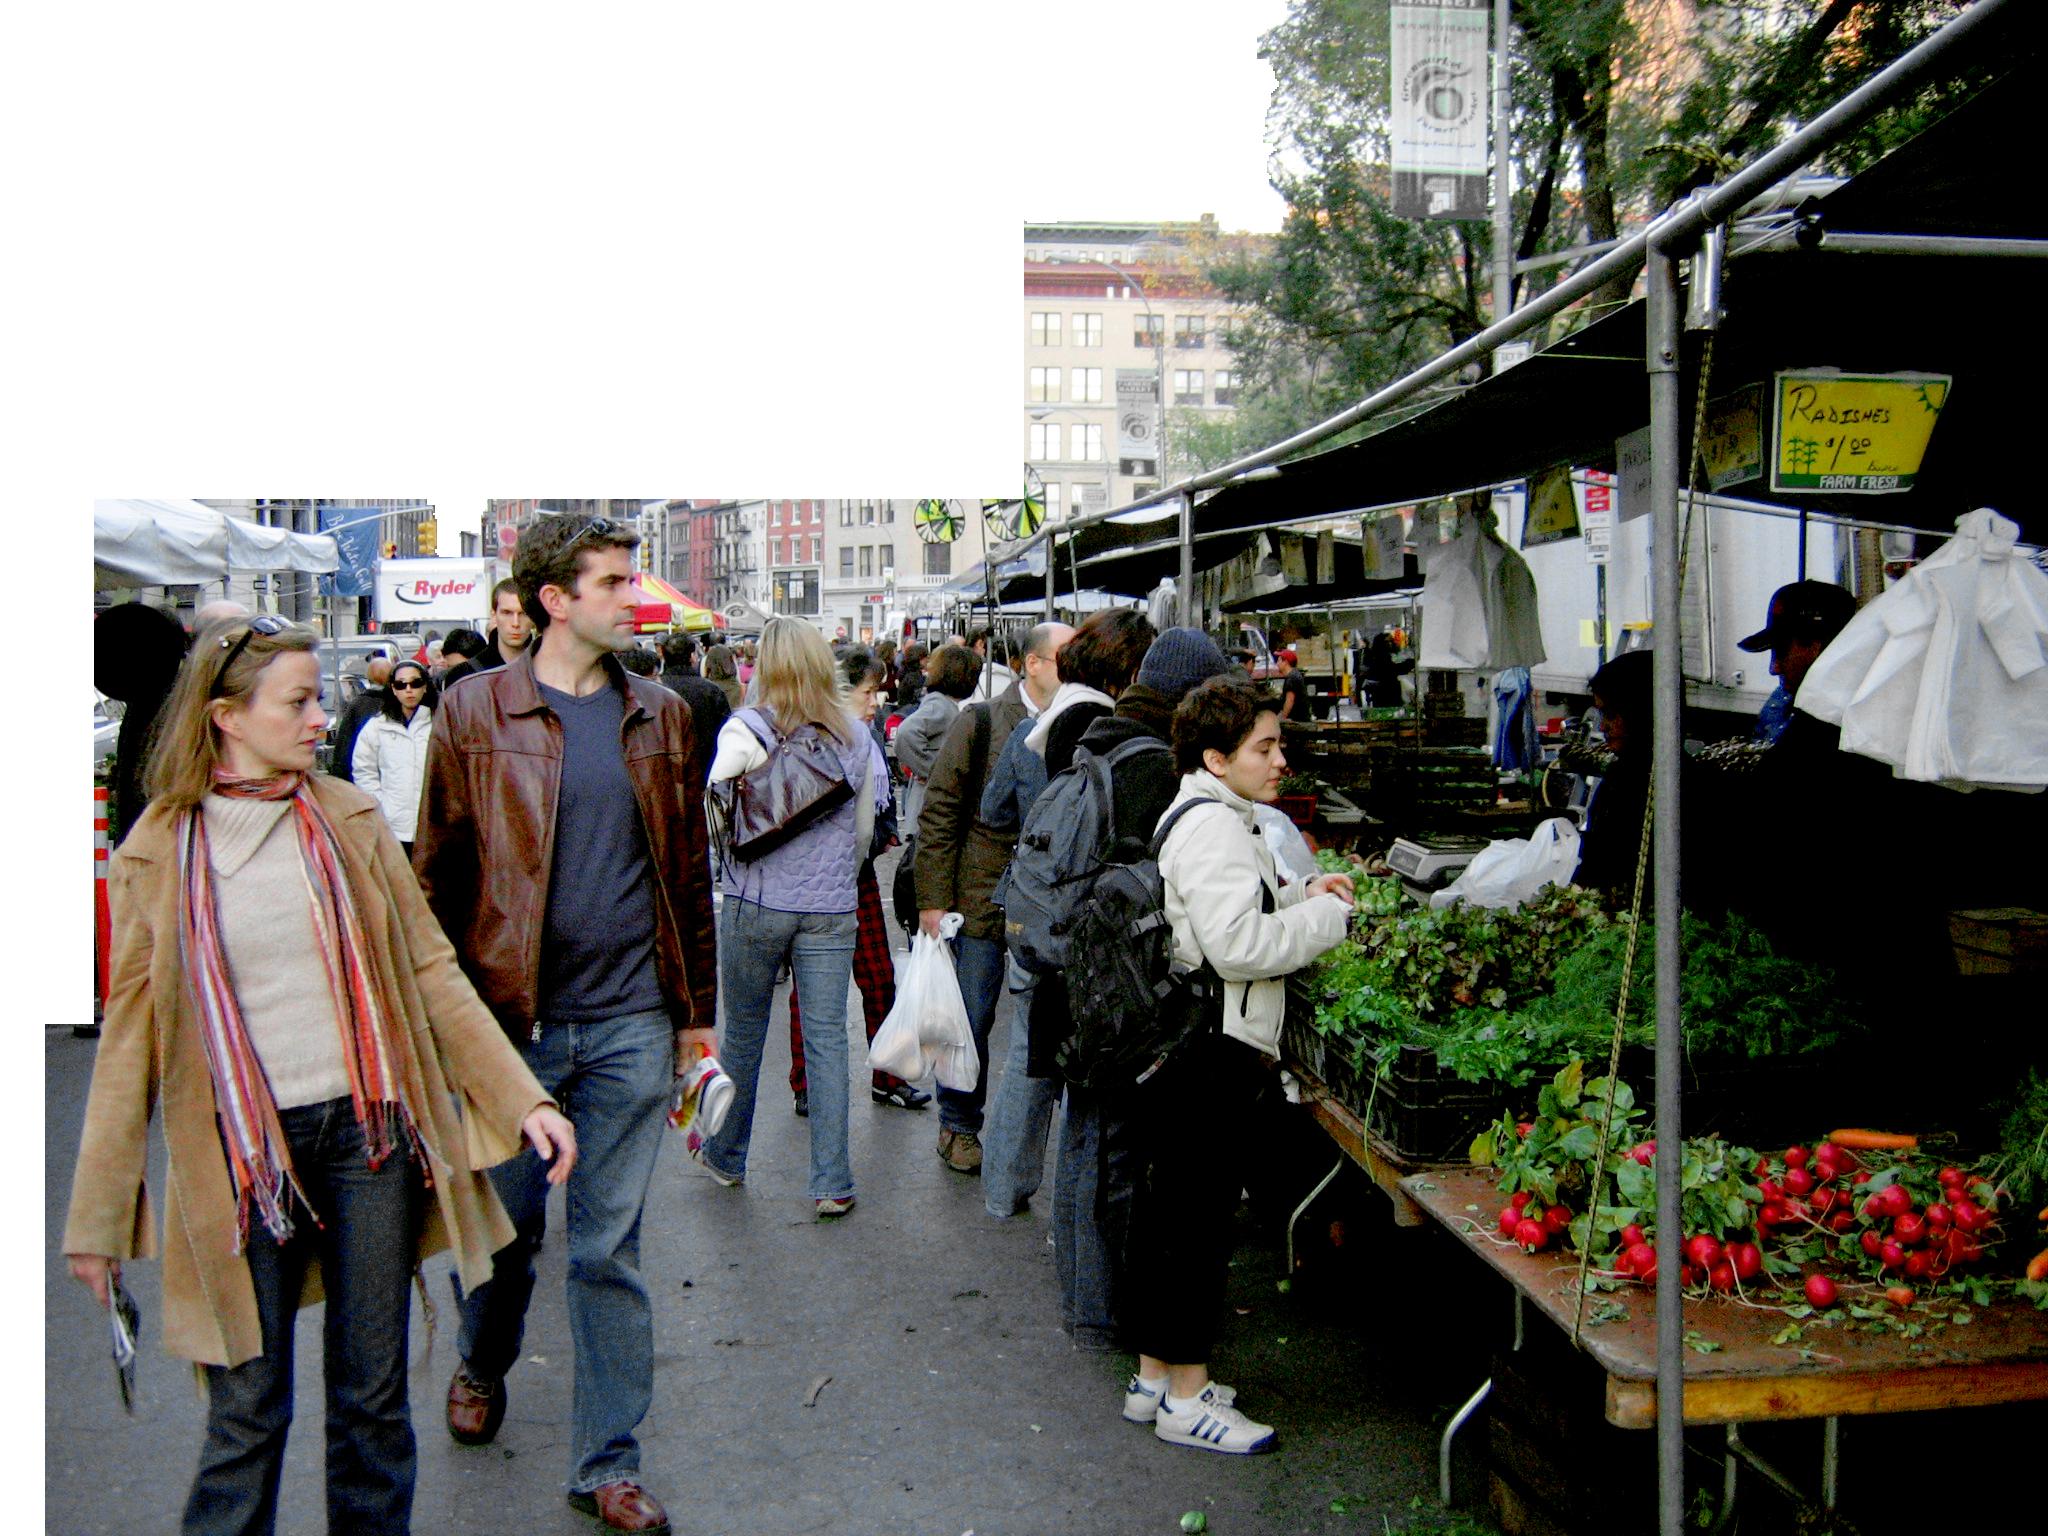 Street Markets Union Square Farmers Market People Cutout Render People